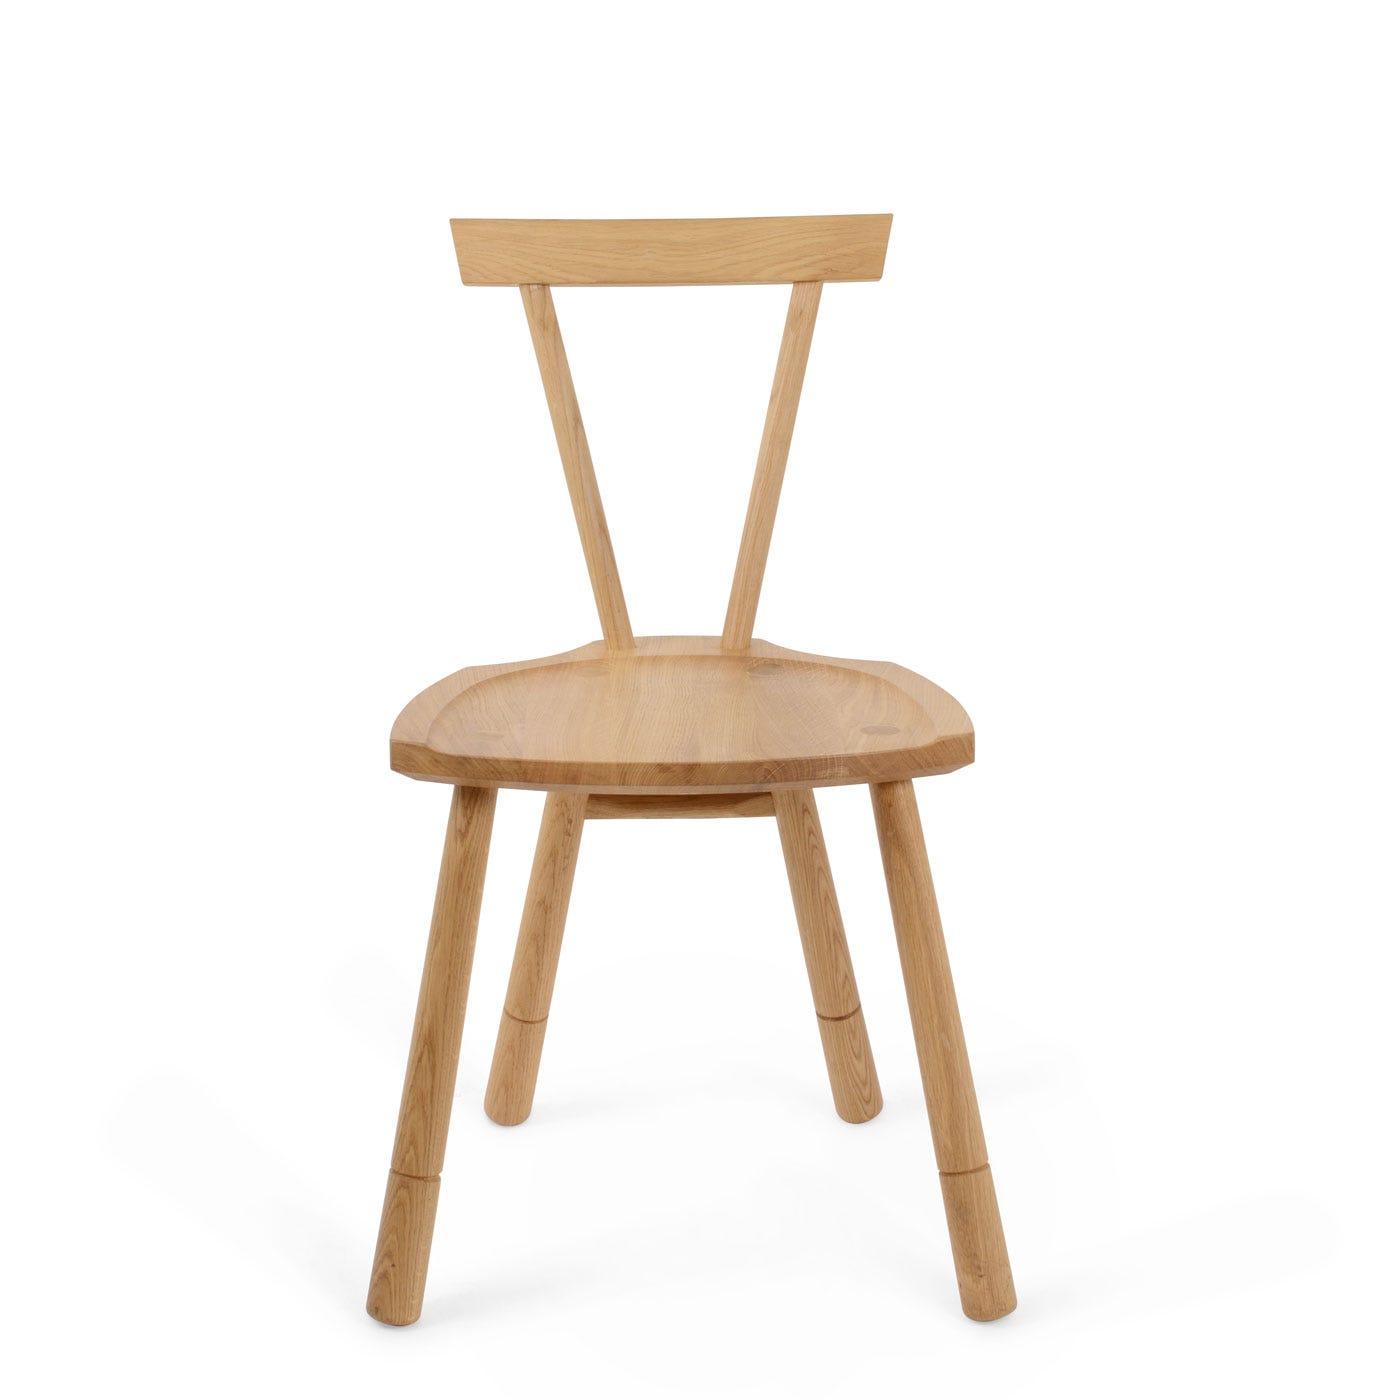 Heal's Whitstable 4 Legged Chair